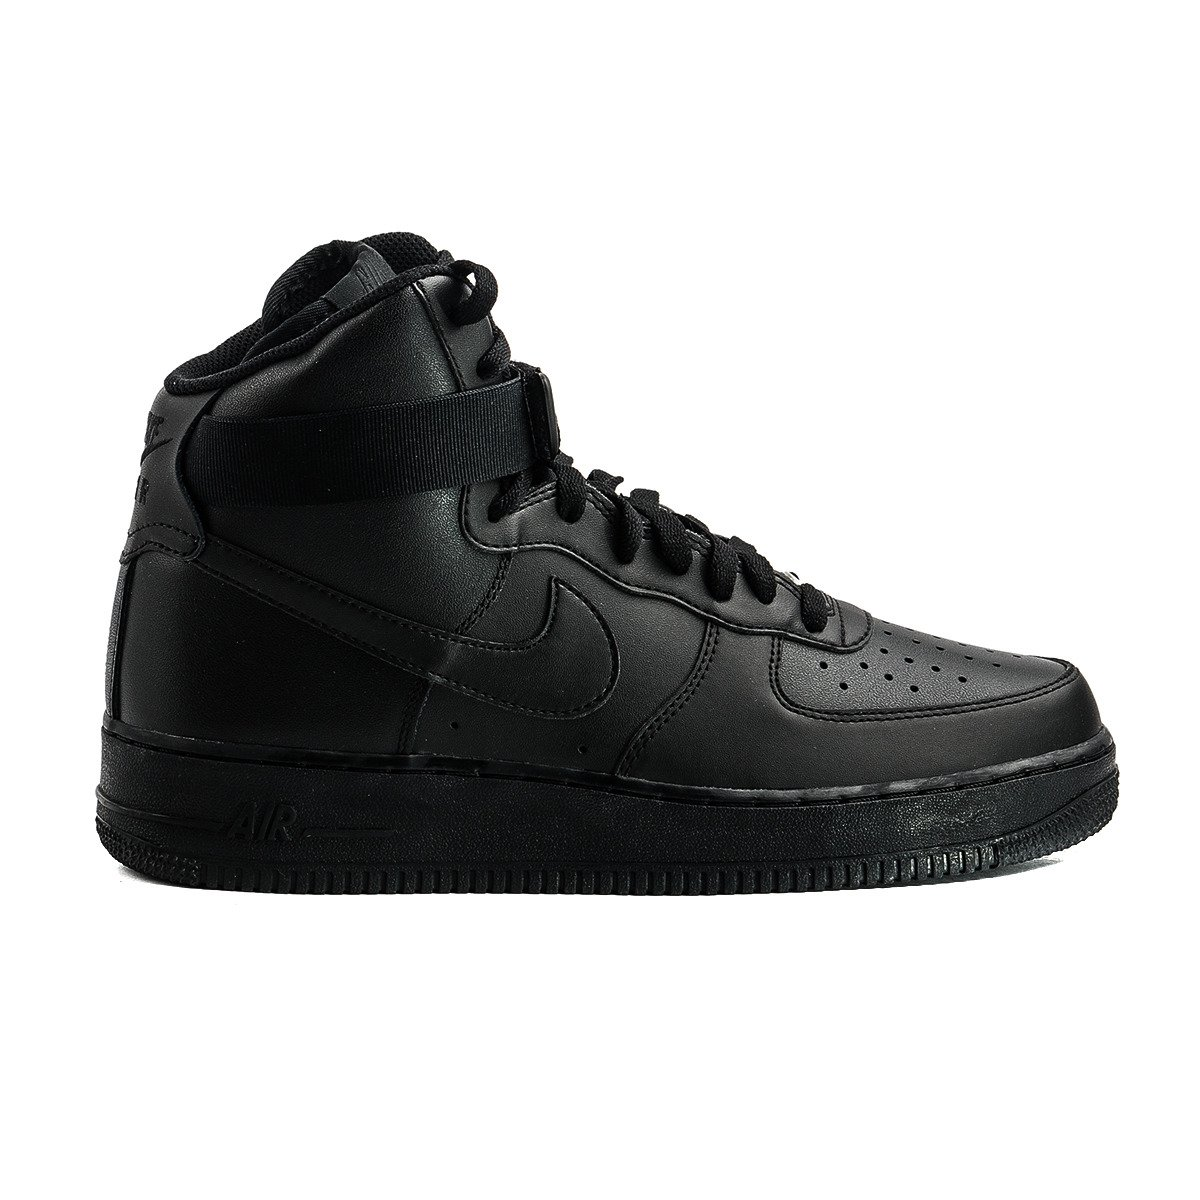 nike air force 1 high 39 07 shoes 315121 032 basketball. Black Bedroom Furniture Sets. Home Design Ideas